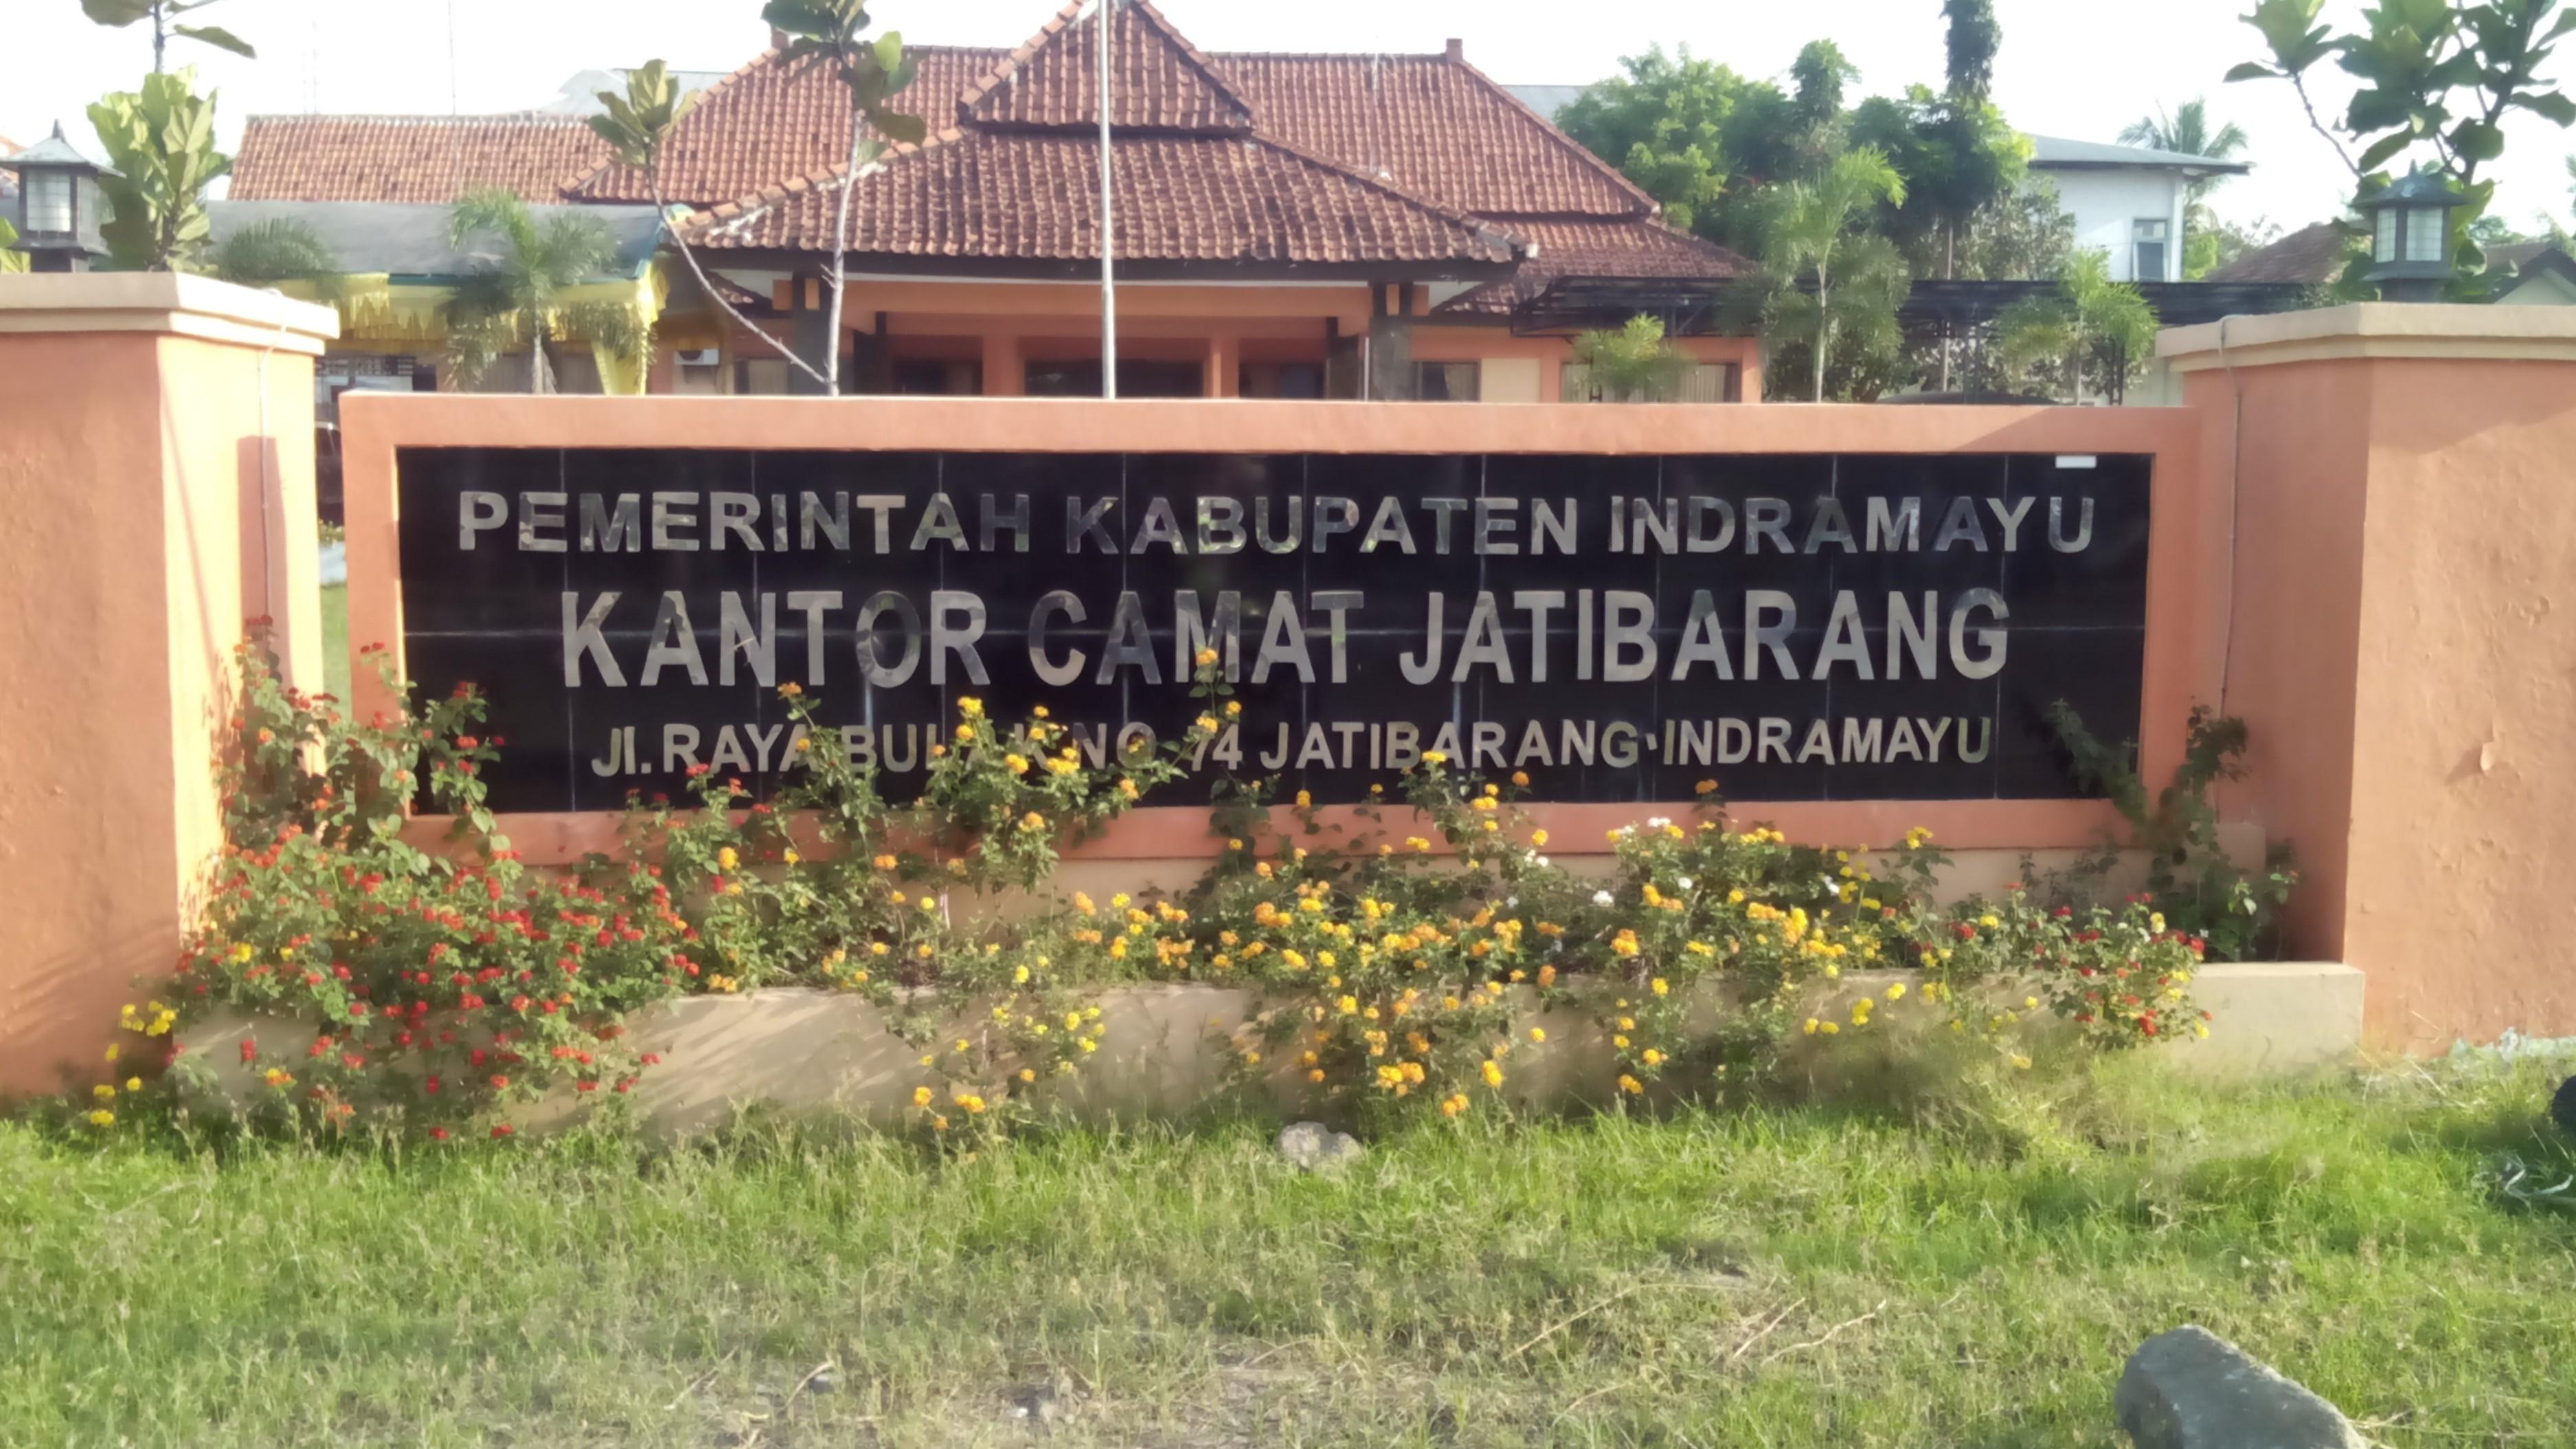 Jatibarang Indramayu Wikipedia Bahasa Indonesia Ensiklopedia Bebas